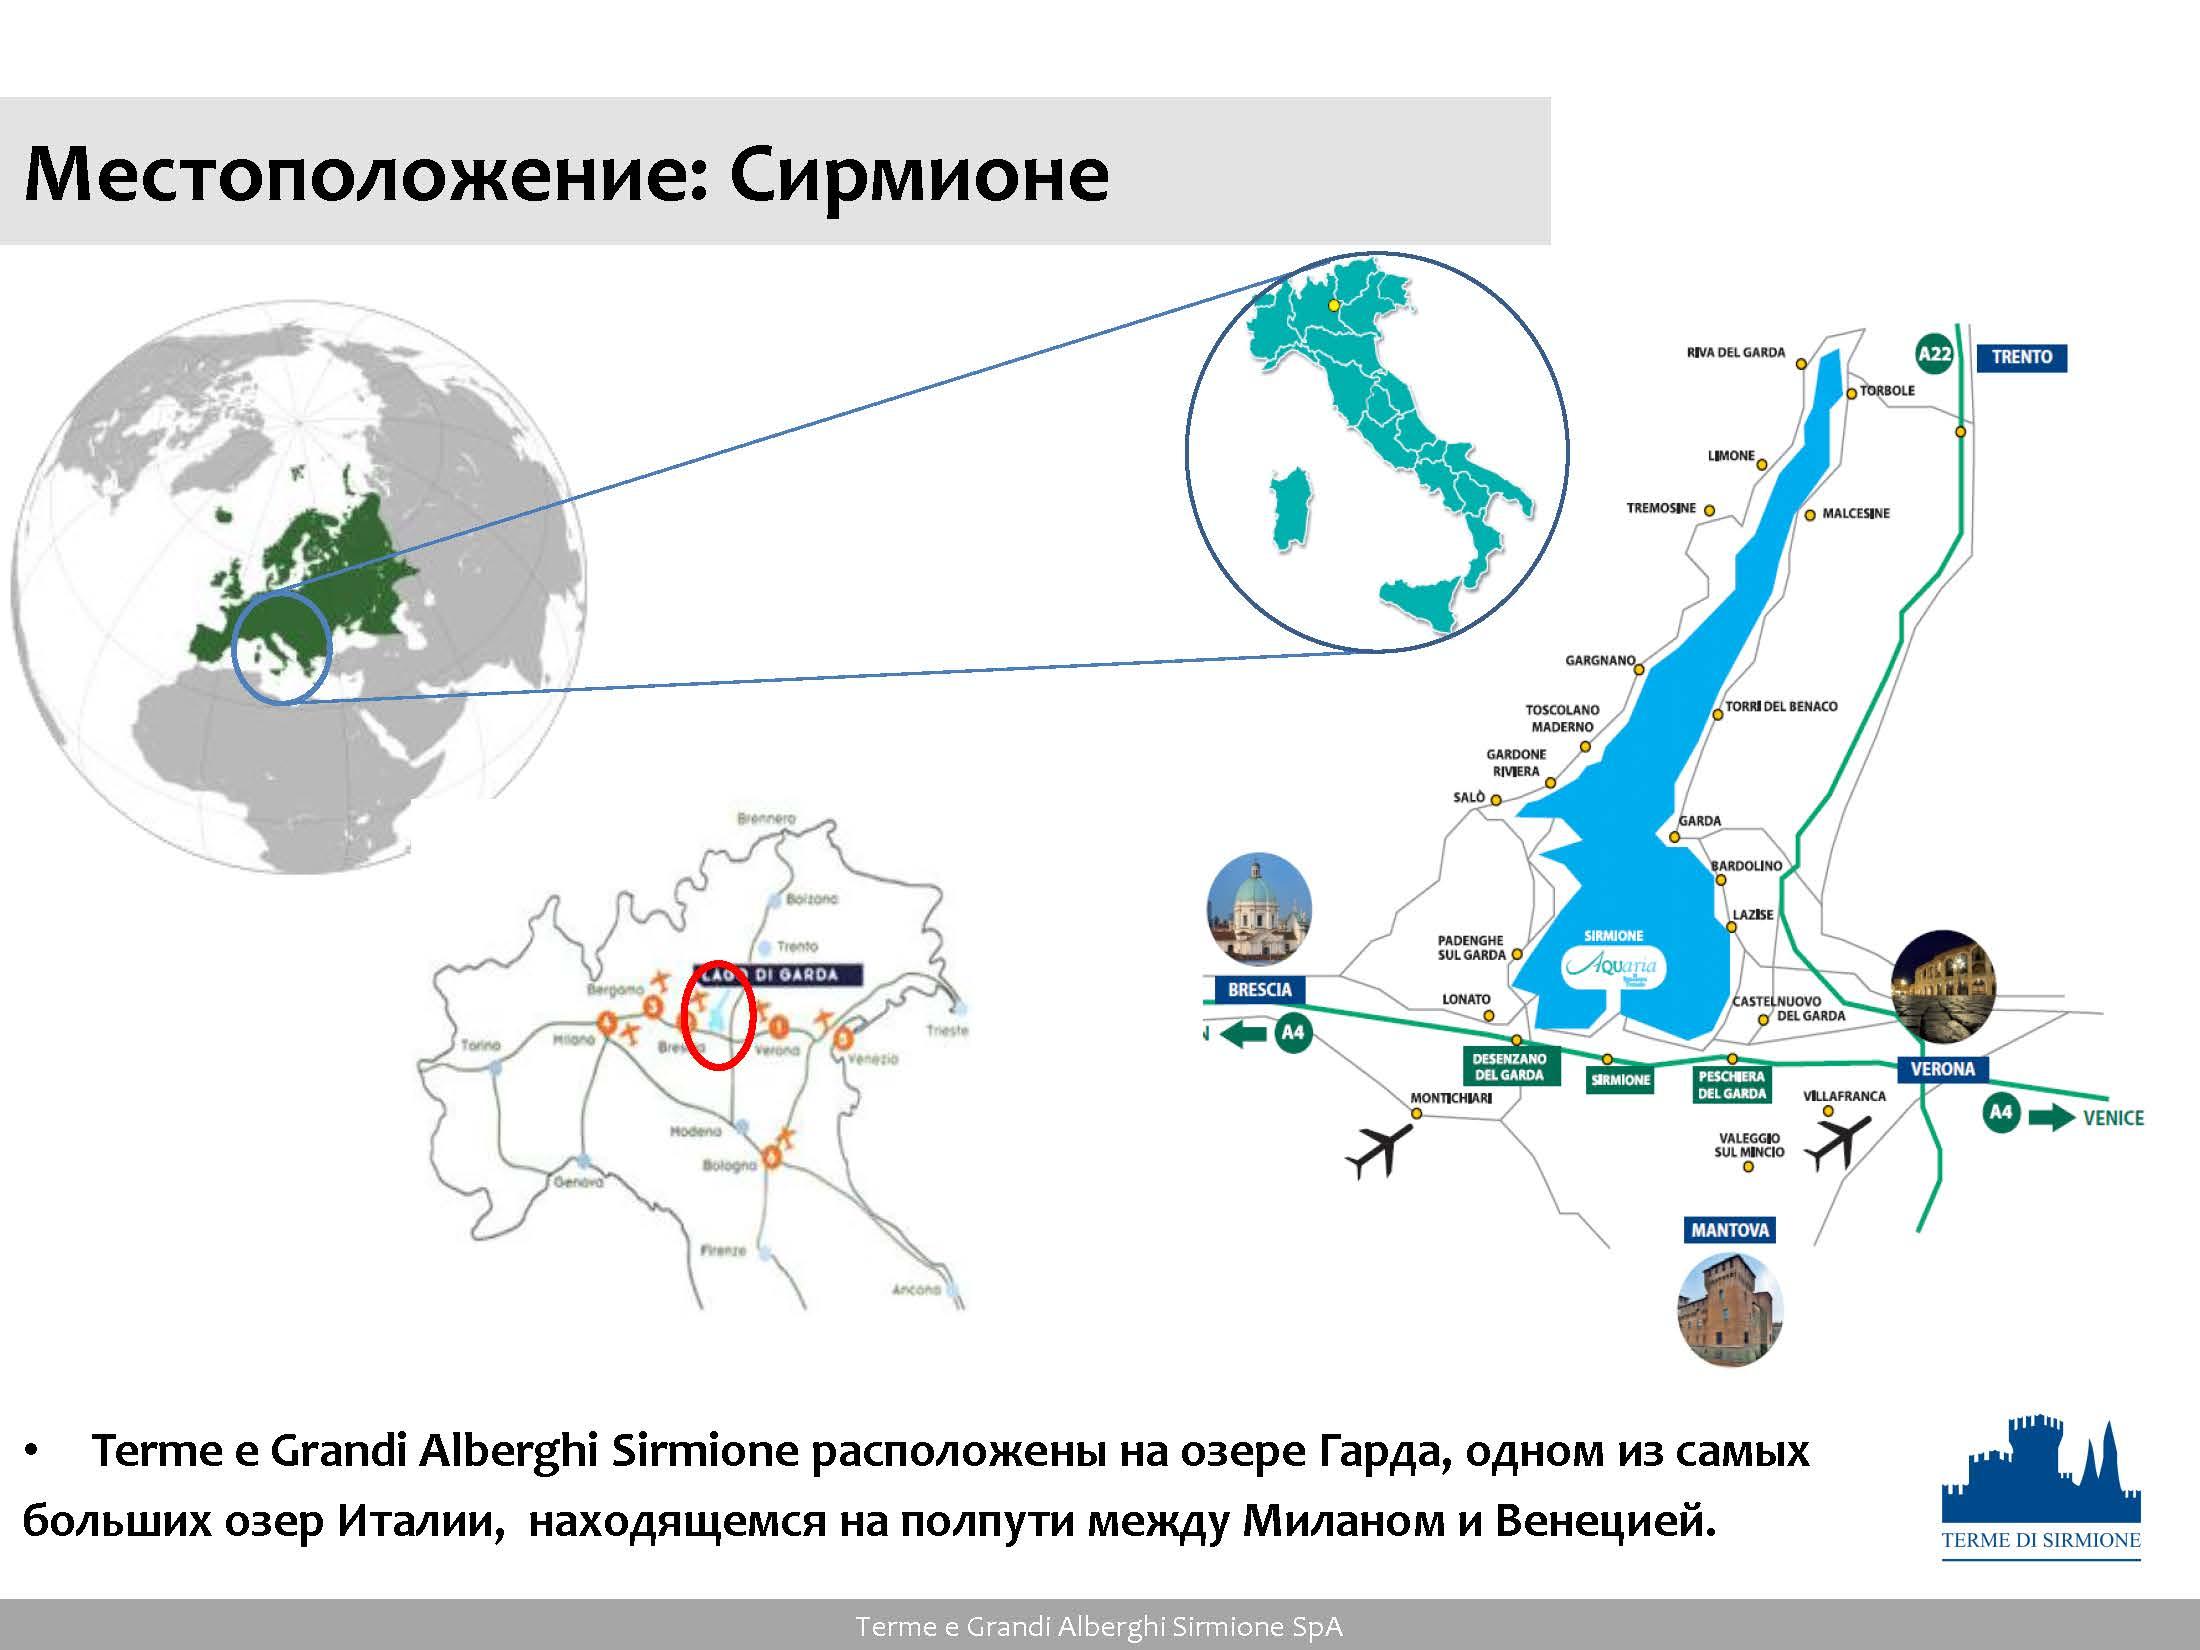 Местоположение термального курорта Терме Сирмионе на карте. Фото